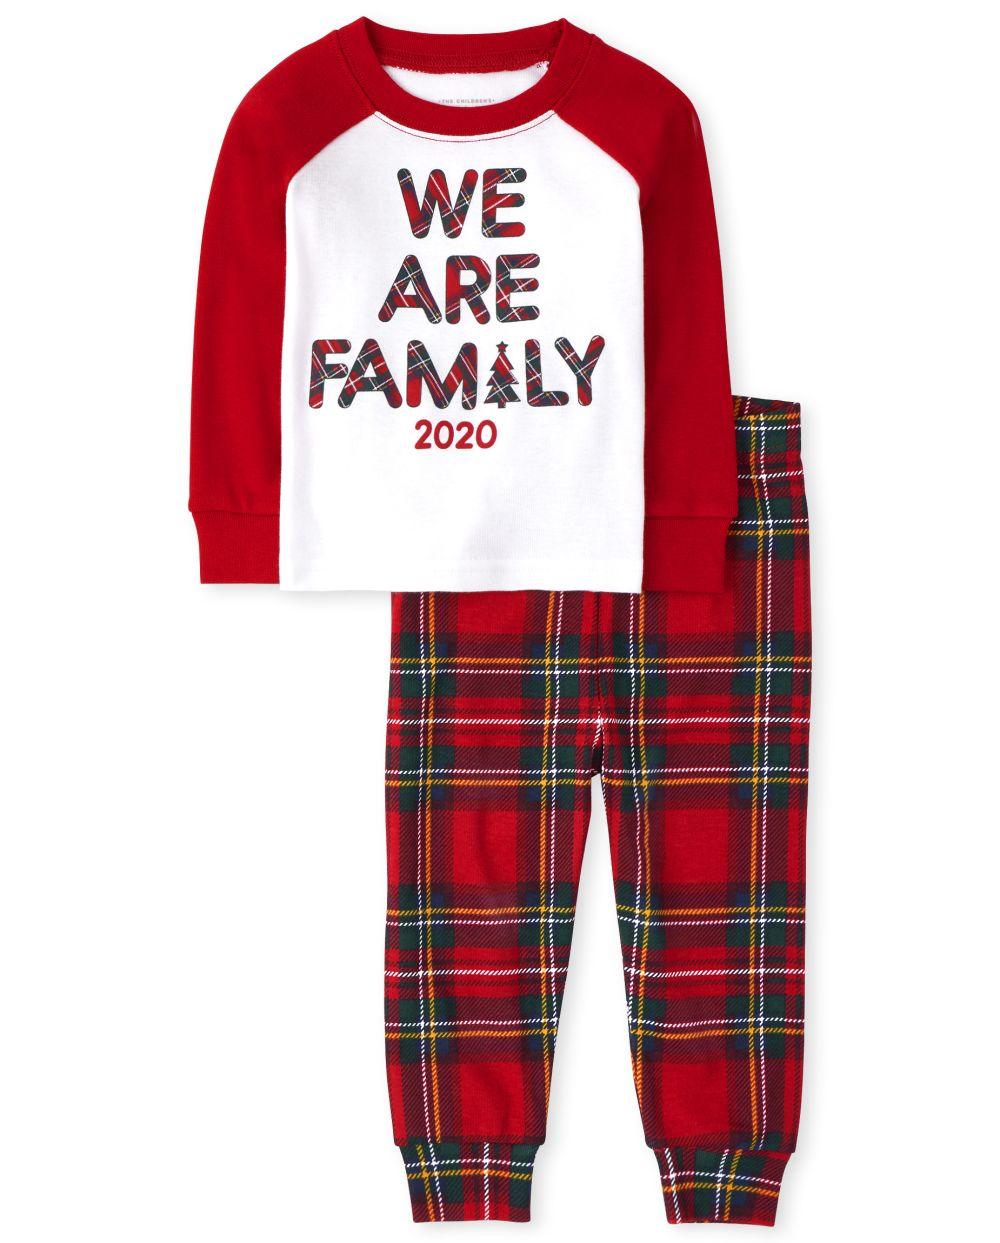 Unisex Baby And Toddler Matching Family Tartan Snug Fit Cotton Pajamas